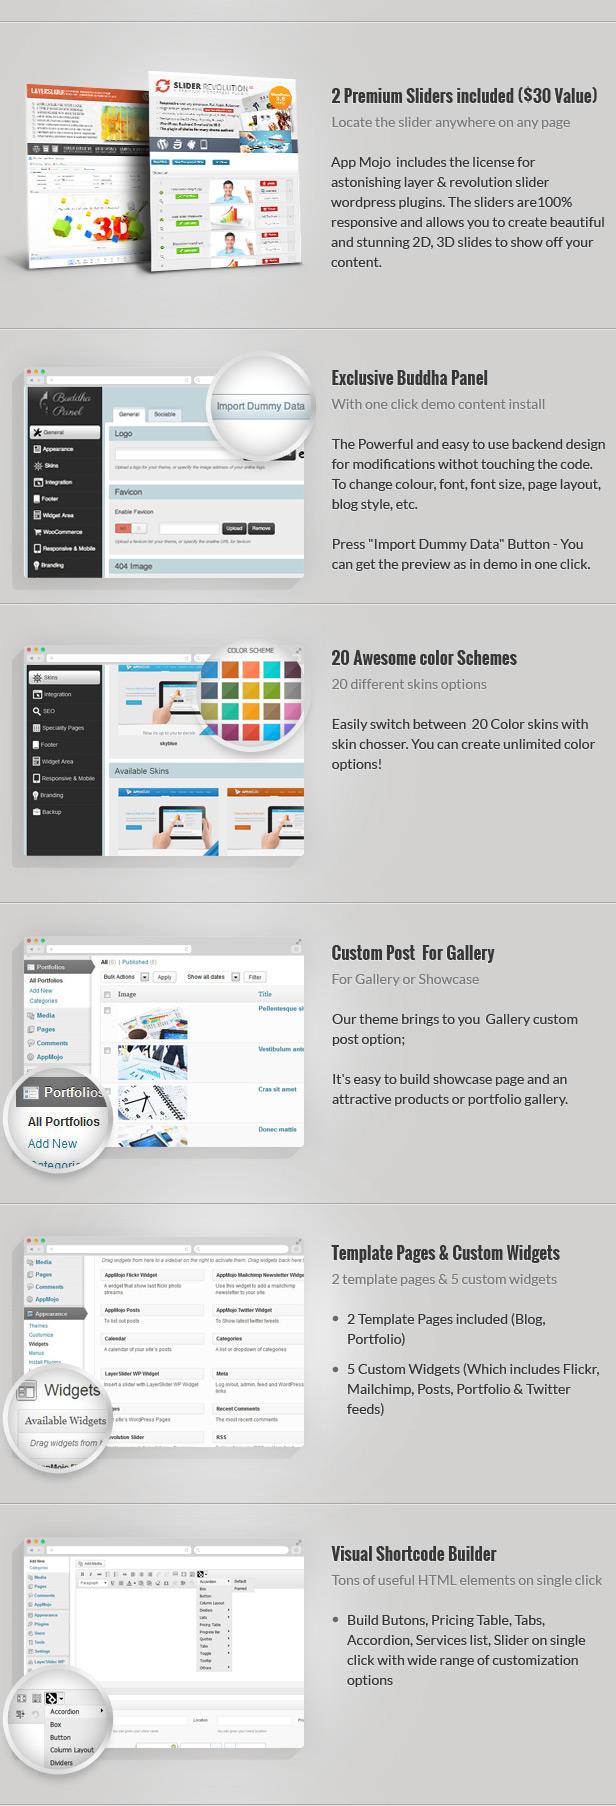 App Mojo - Single Page Software Promotion Theme  App Mojo - Single Page Software Promotion Theme  App Mojo - Single Page Software Promotion Theme